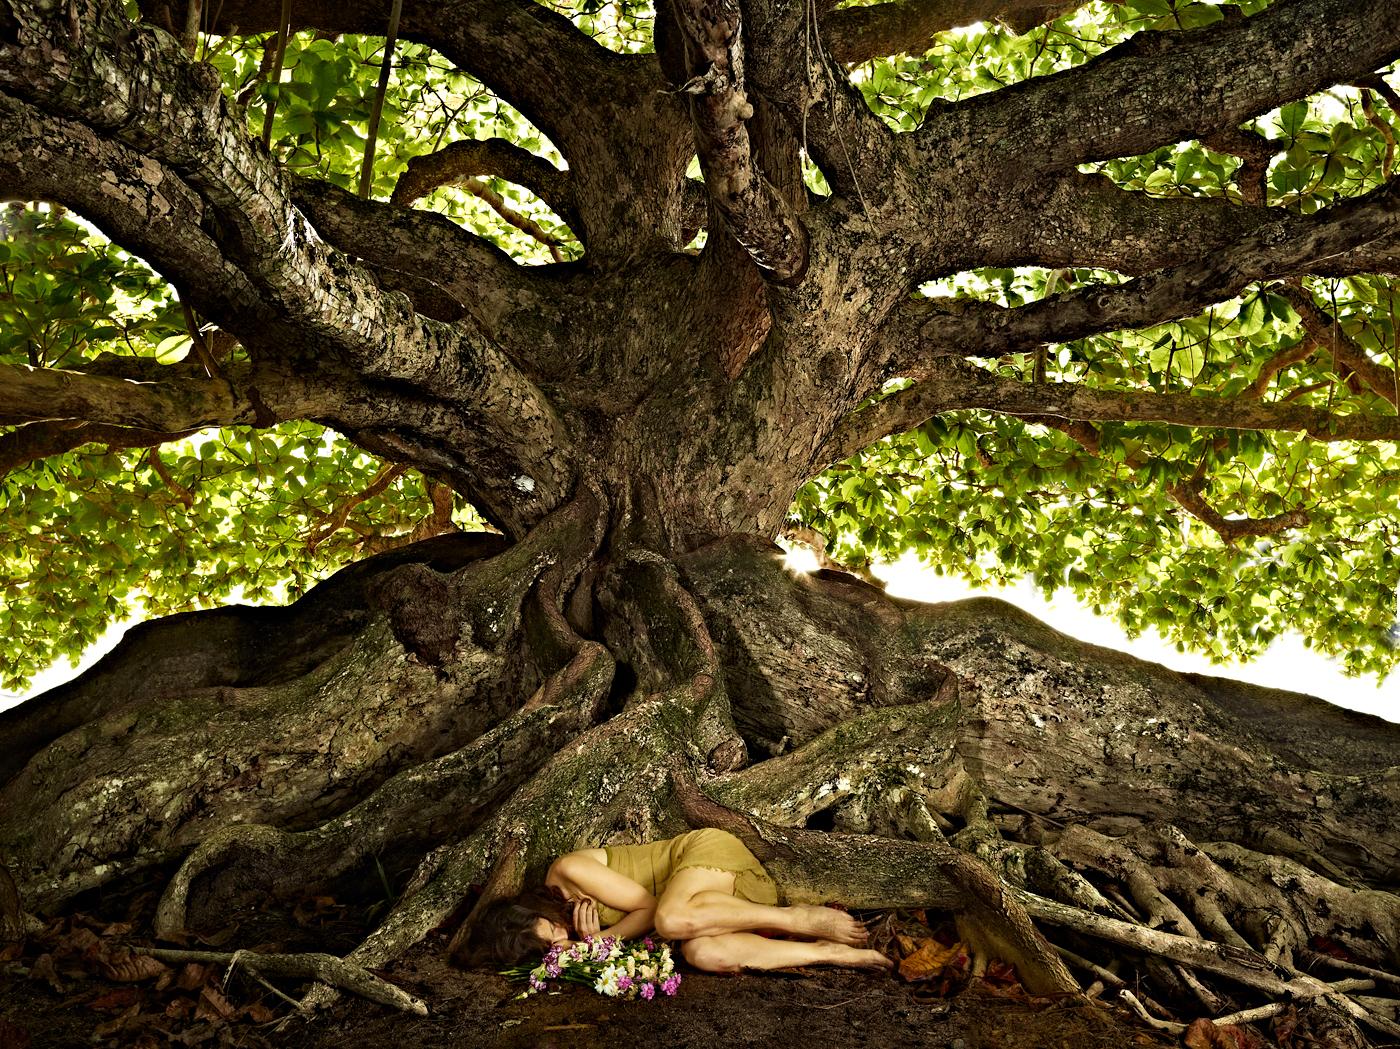 Behind the scenes at the Banyan Tree